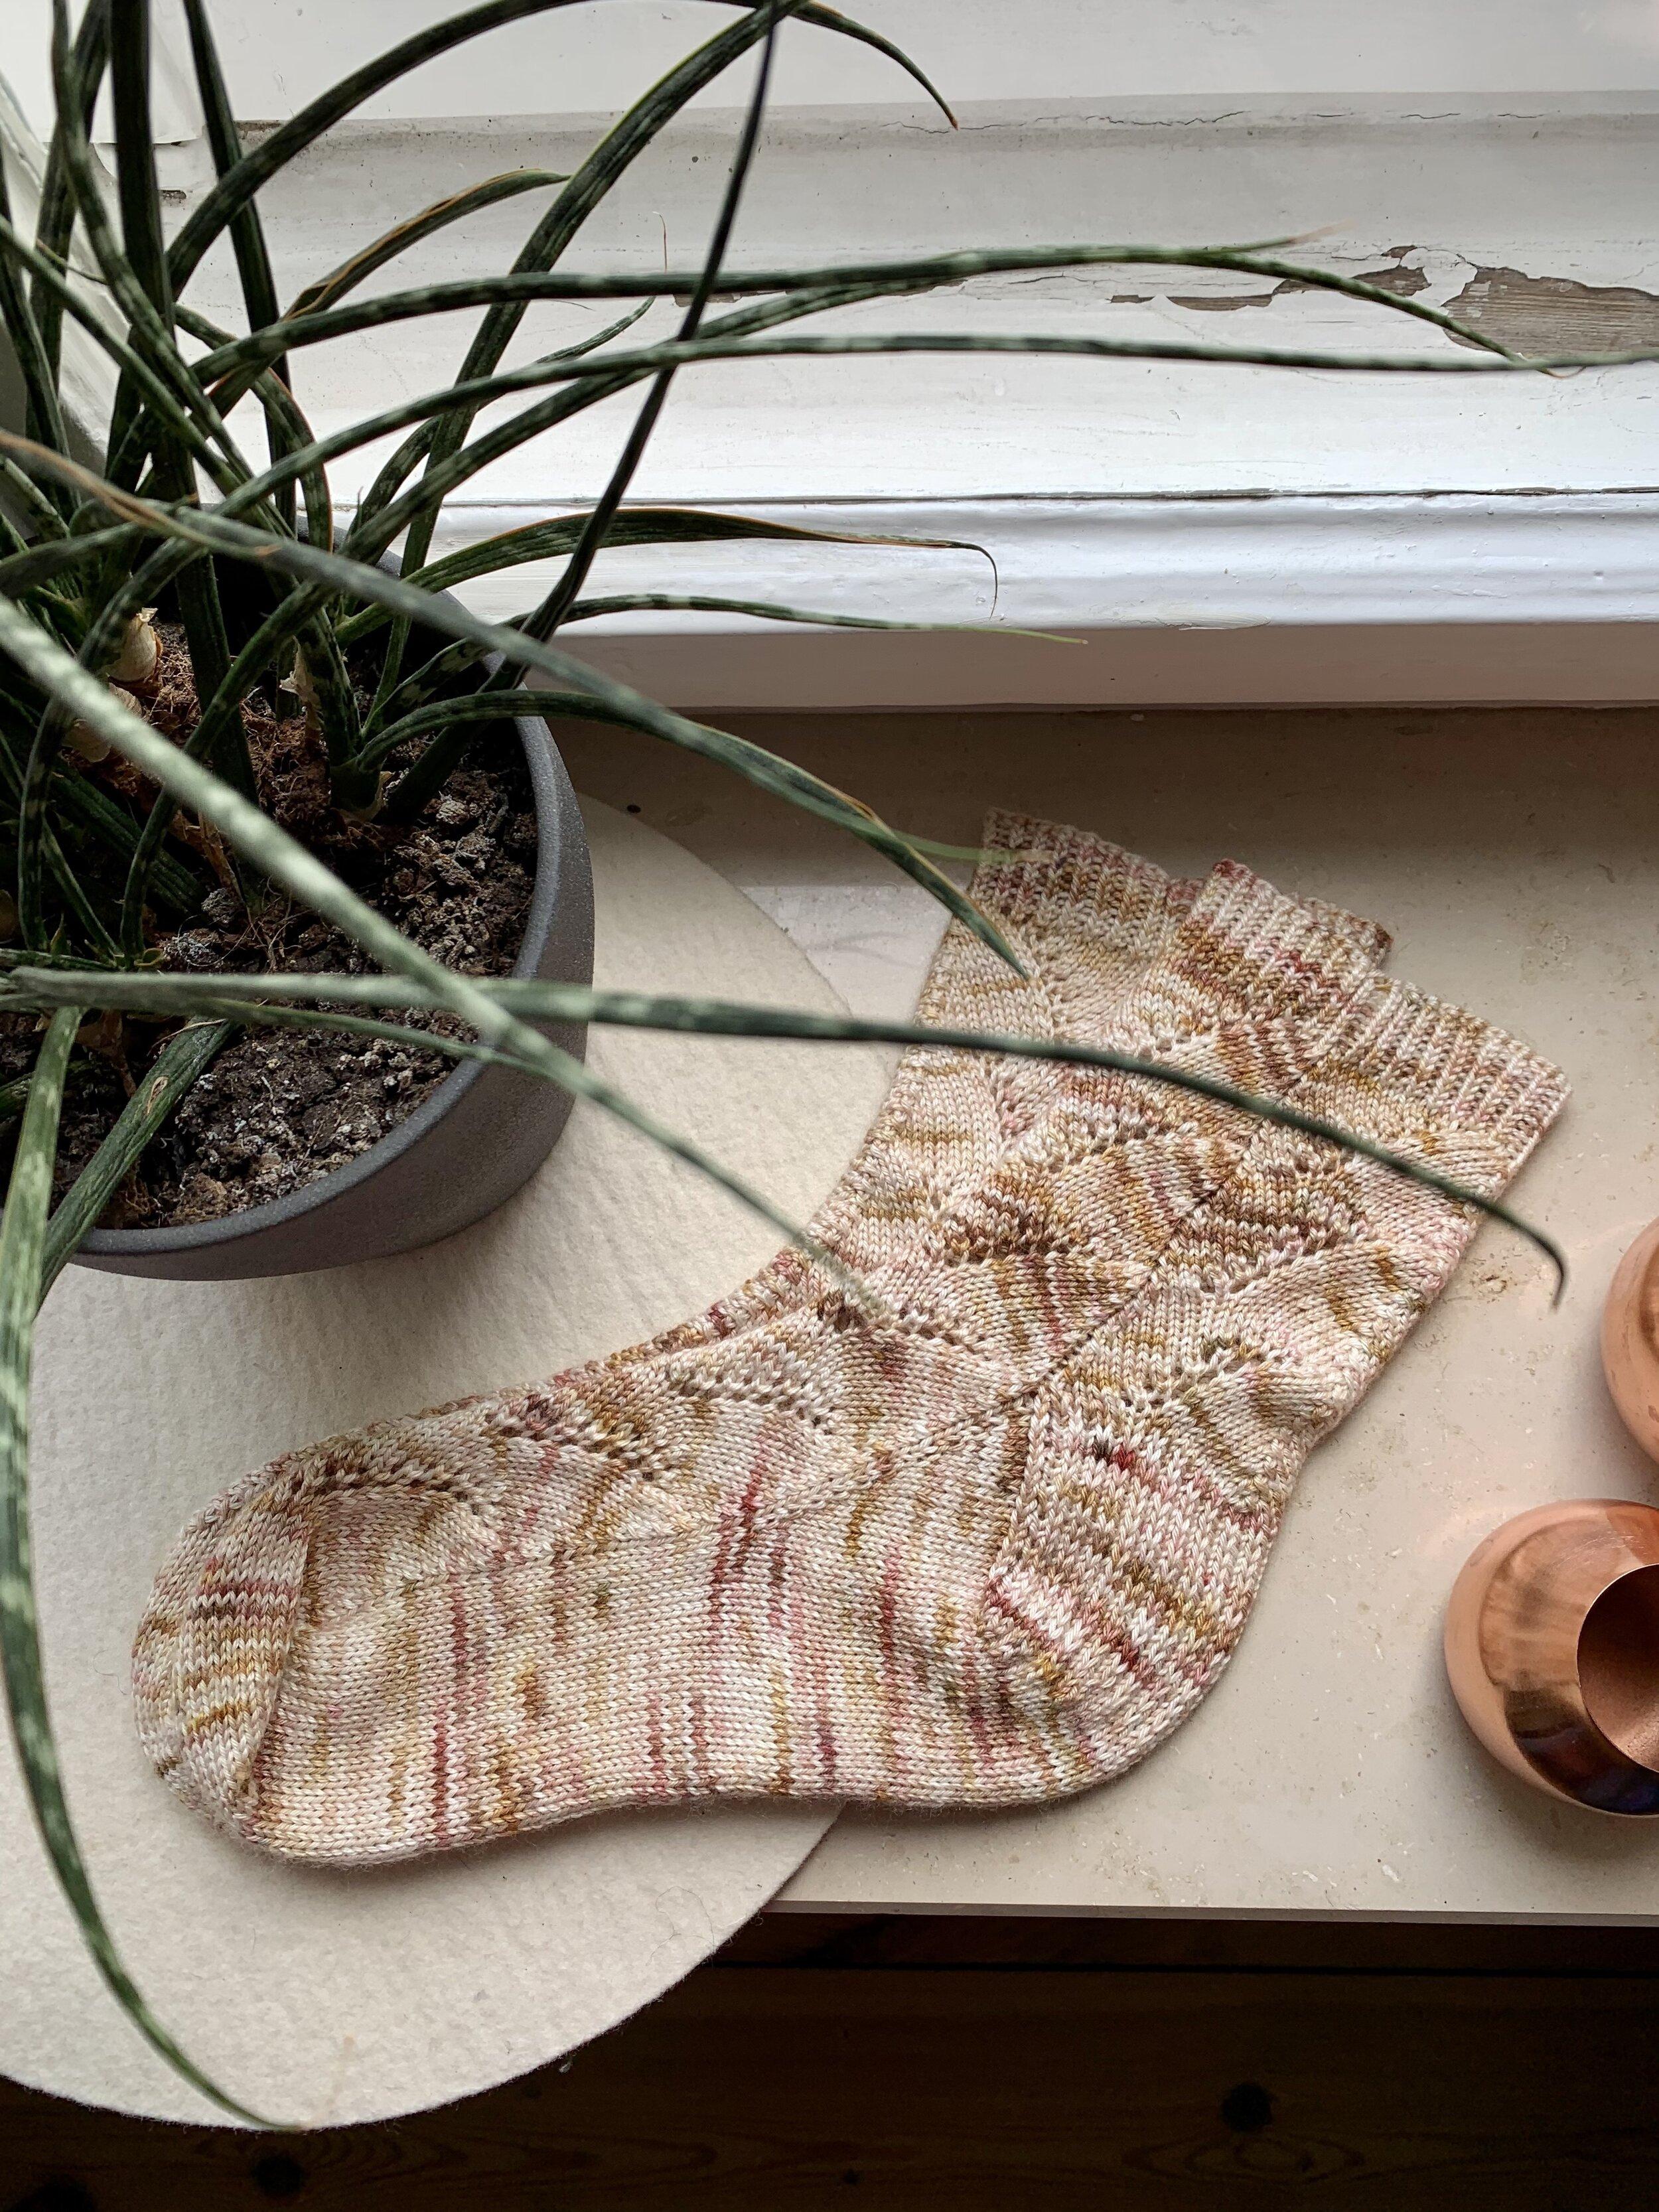 Hanna Lisa's Wild Grass Socks, knit in Woolapyk yarn